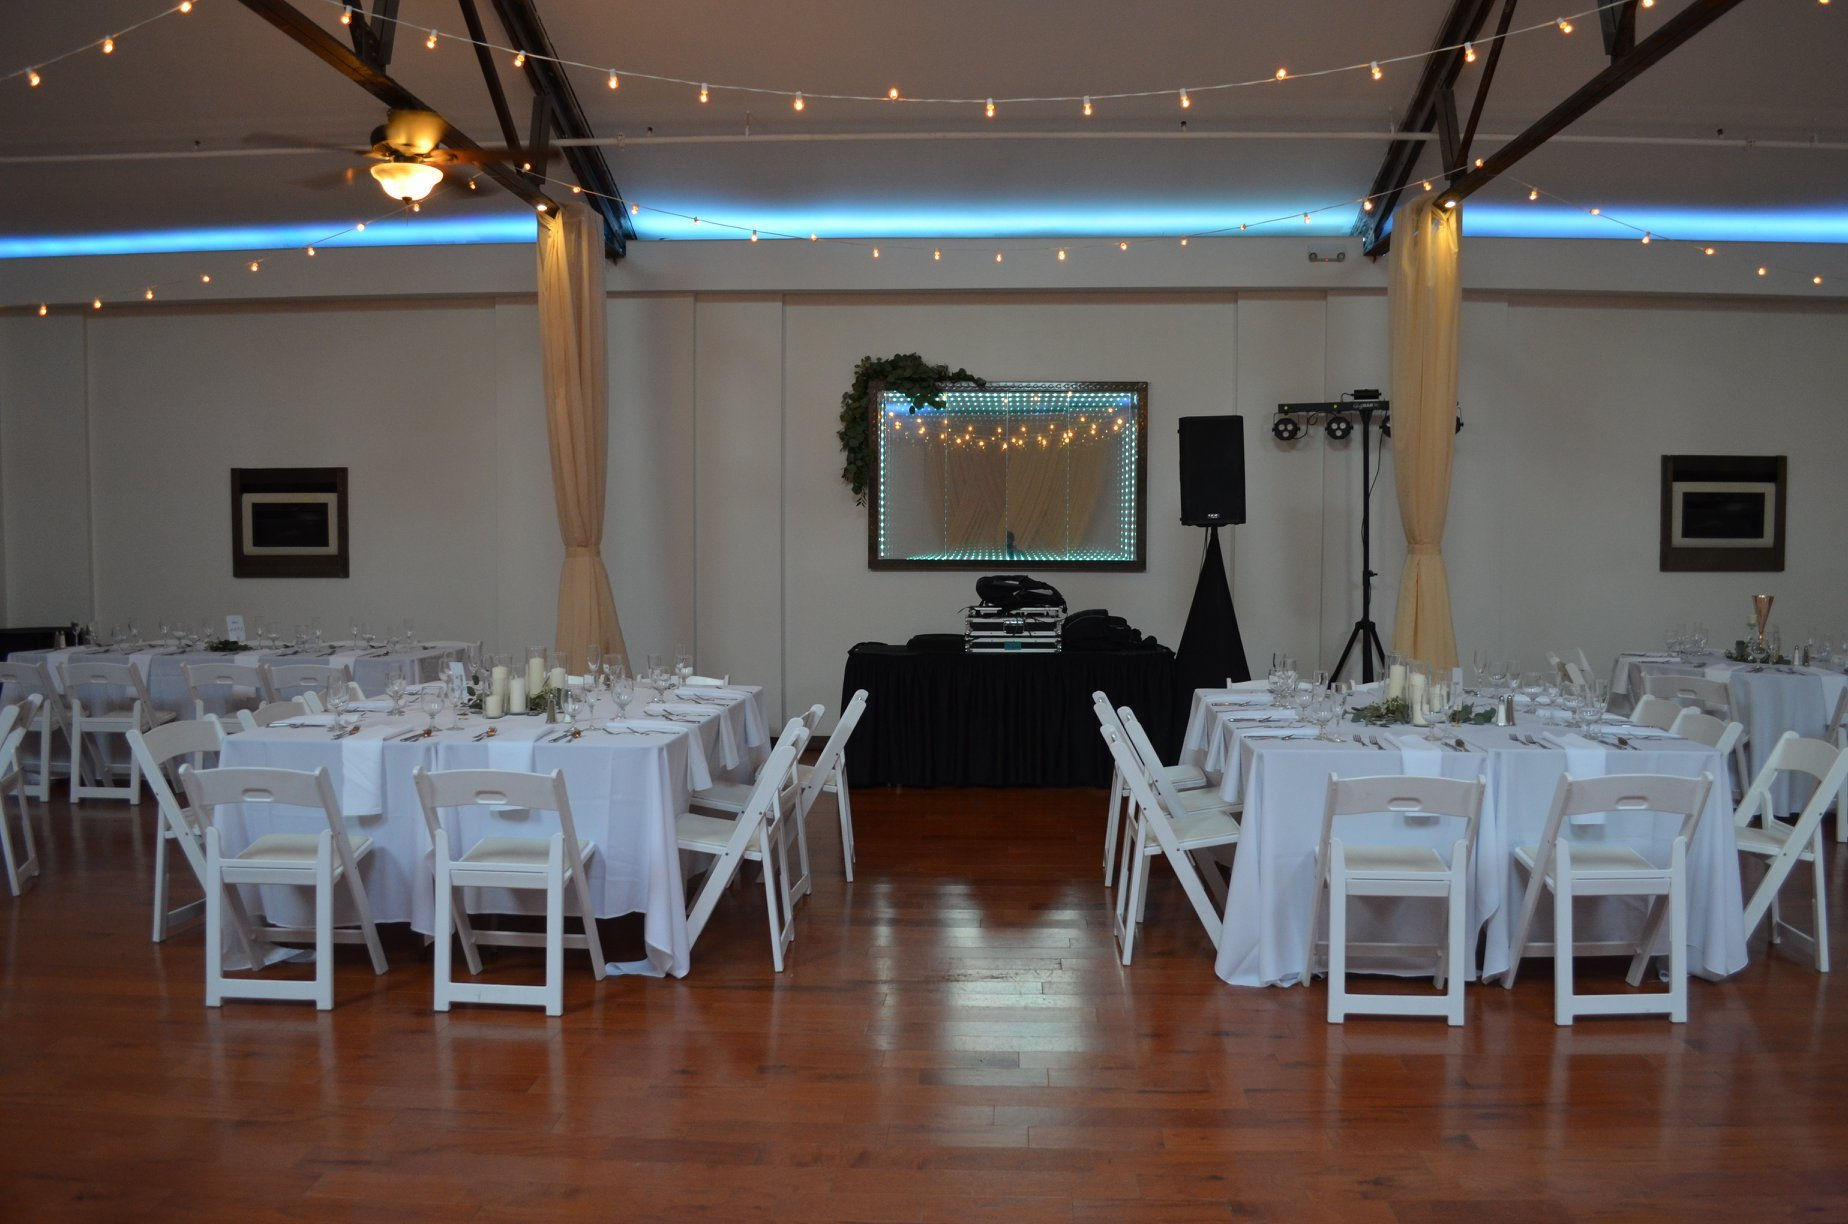 banquet room small setup